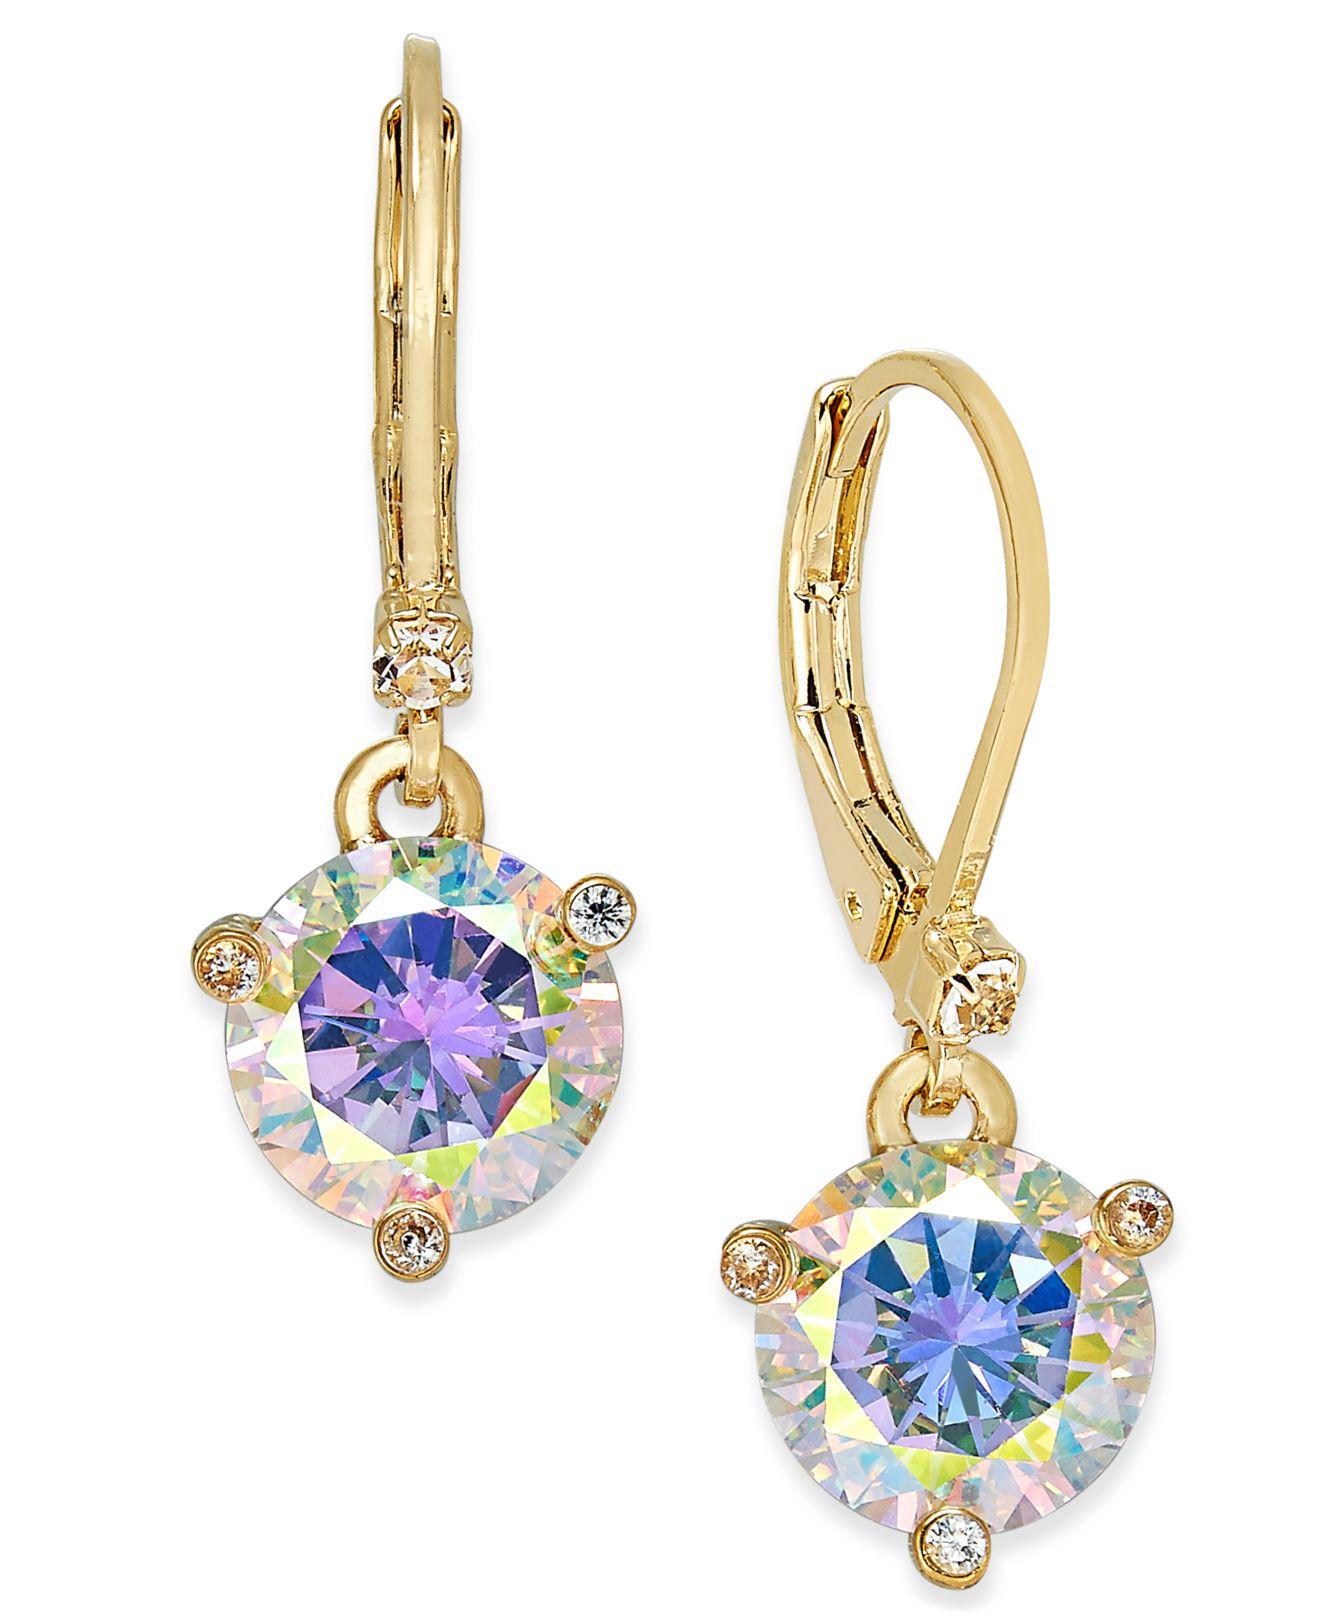 3abccf22d94e0 Kate Spade Gold-tone Blue Crystal Drop Earrings in Metallic - Lyst